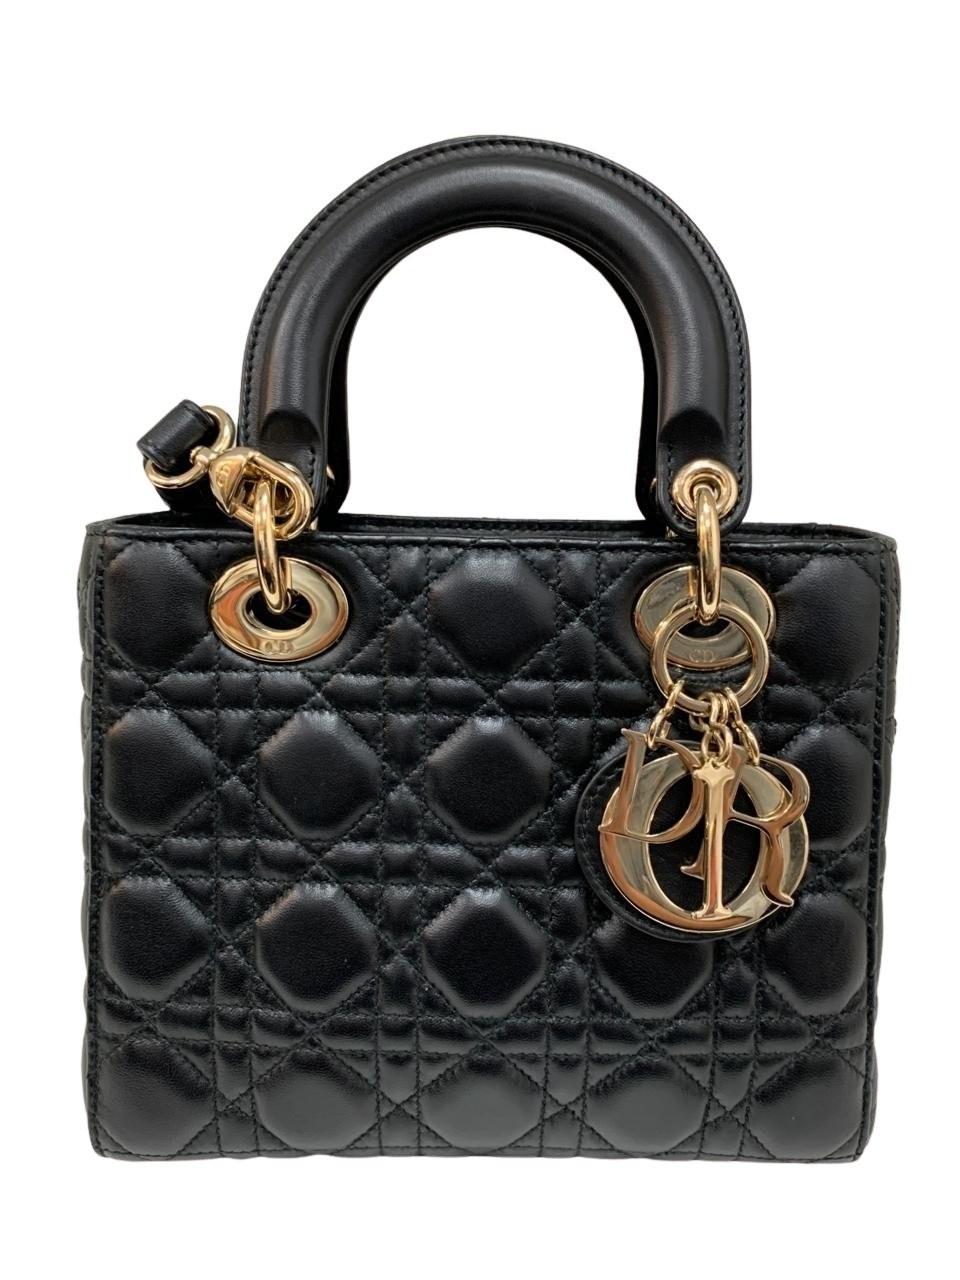 Bolsa Lady Dior Preta